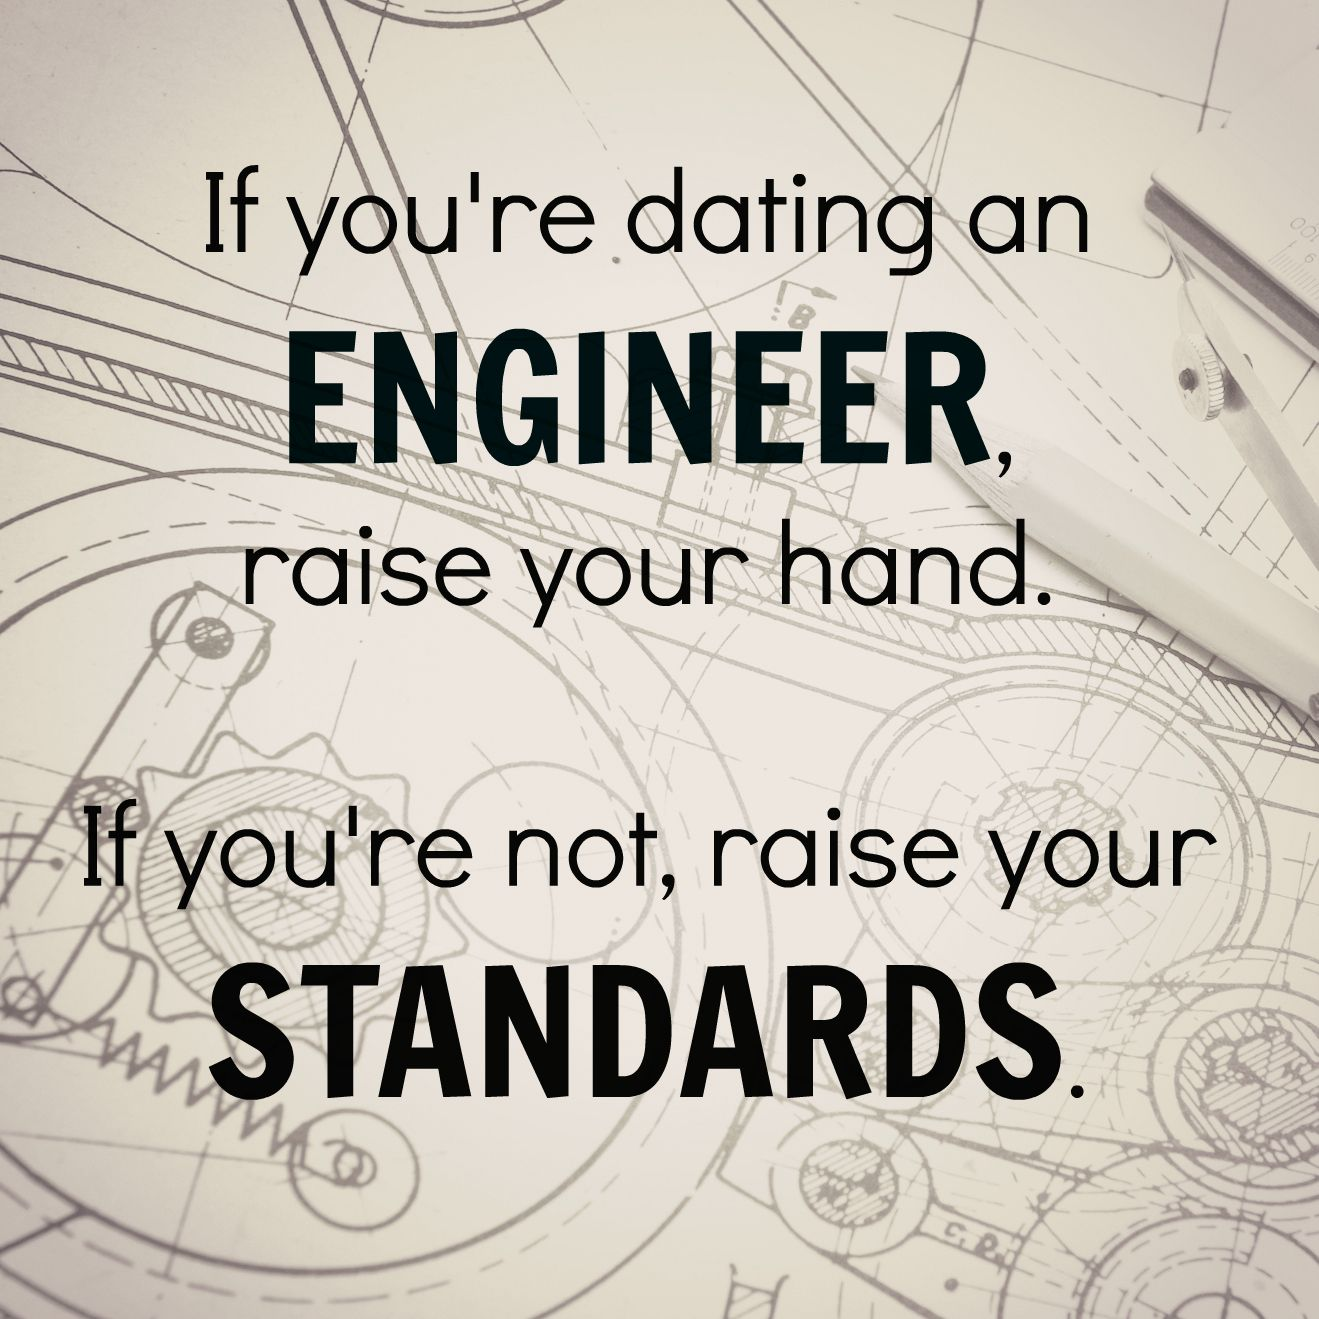 Engineering Standards Civil Engineering Quotes Engineering Quotes Quotes About Engineering